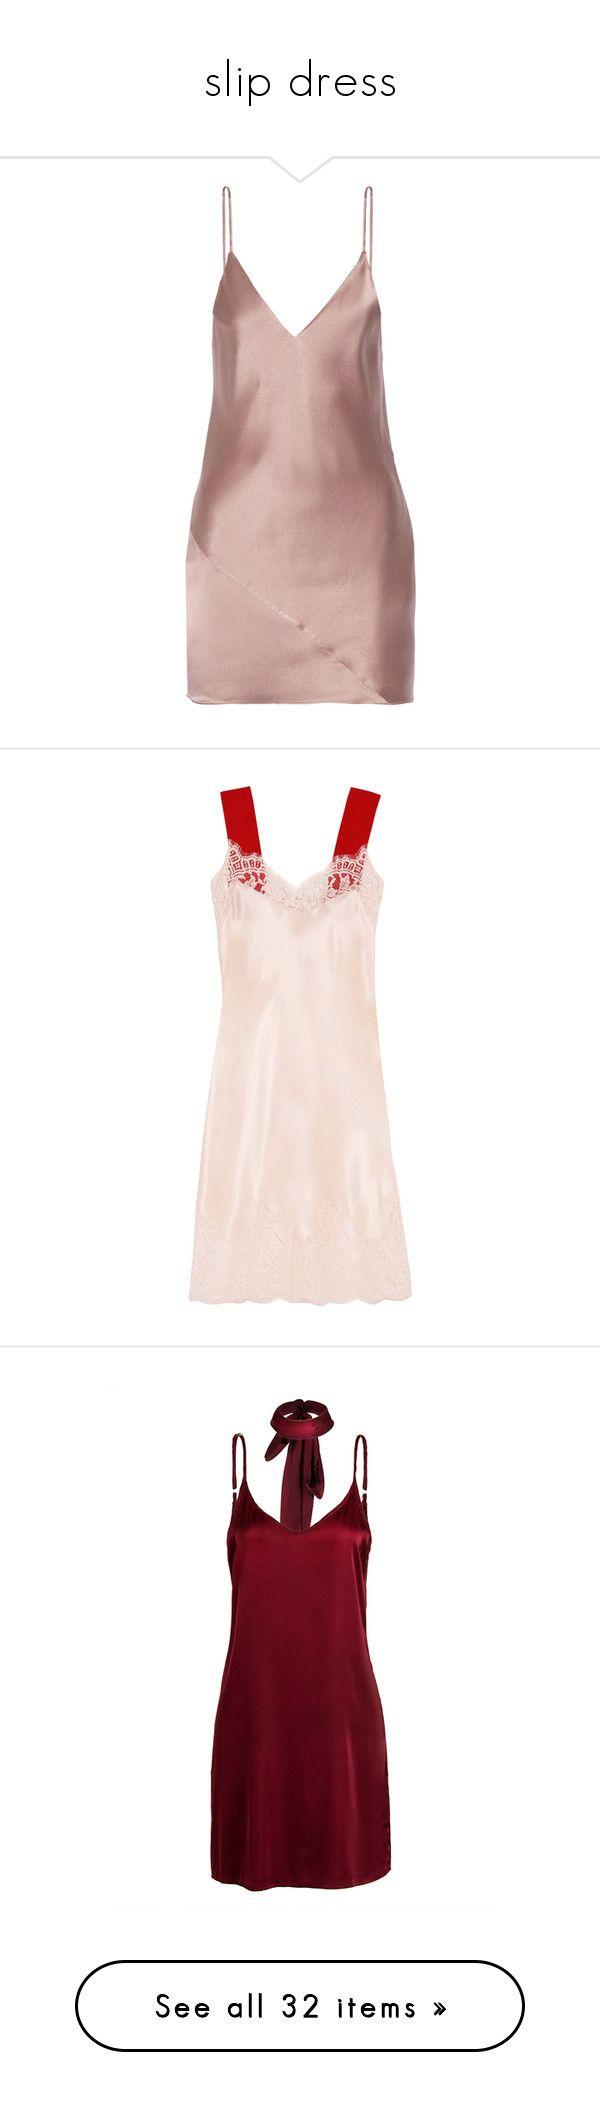 """slip dress"" by neko-m-tucker-smith ❤ liked on Polyvore featuring intimates, shapewear, dresses, beige, mini dress, vestido, slip on dress, pink mini dress, silk satin dress and pink dress"